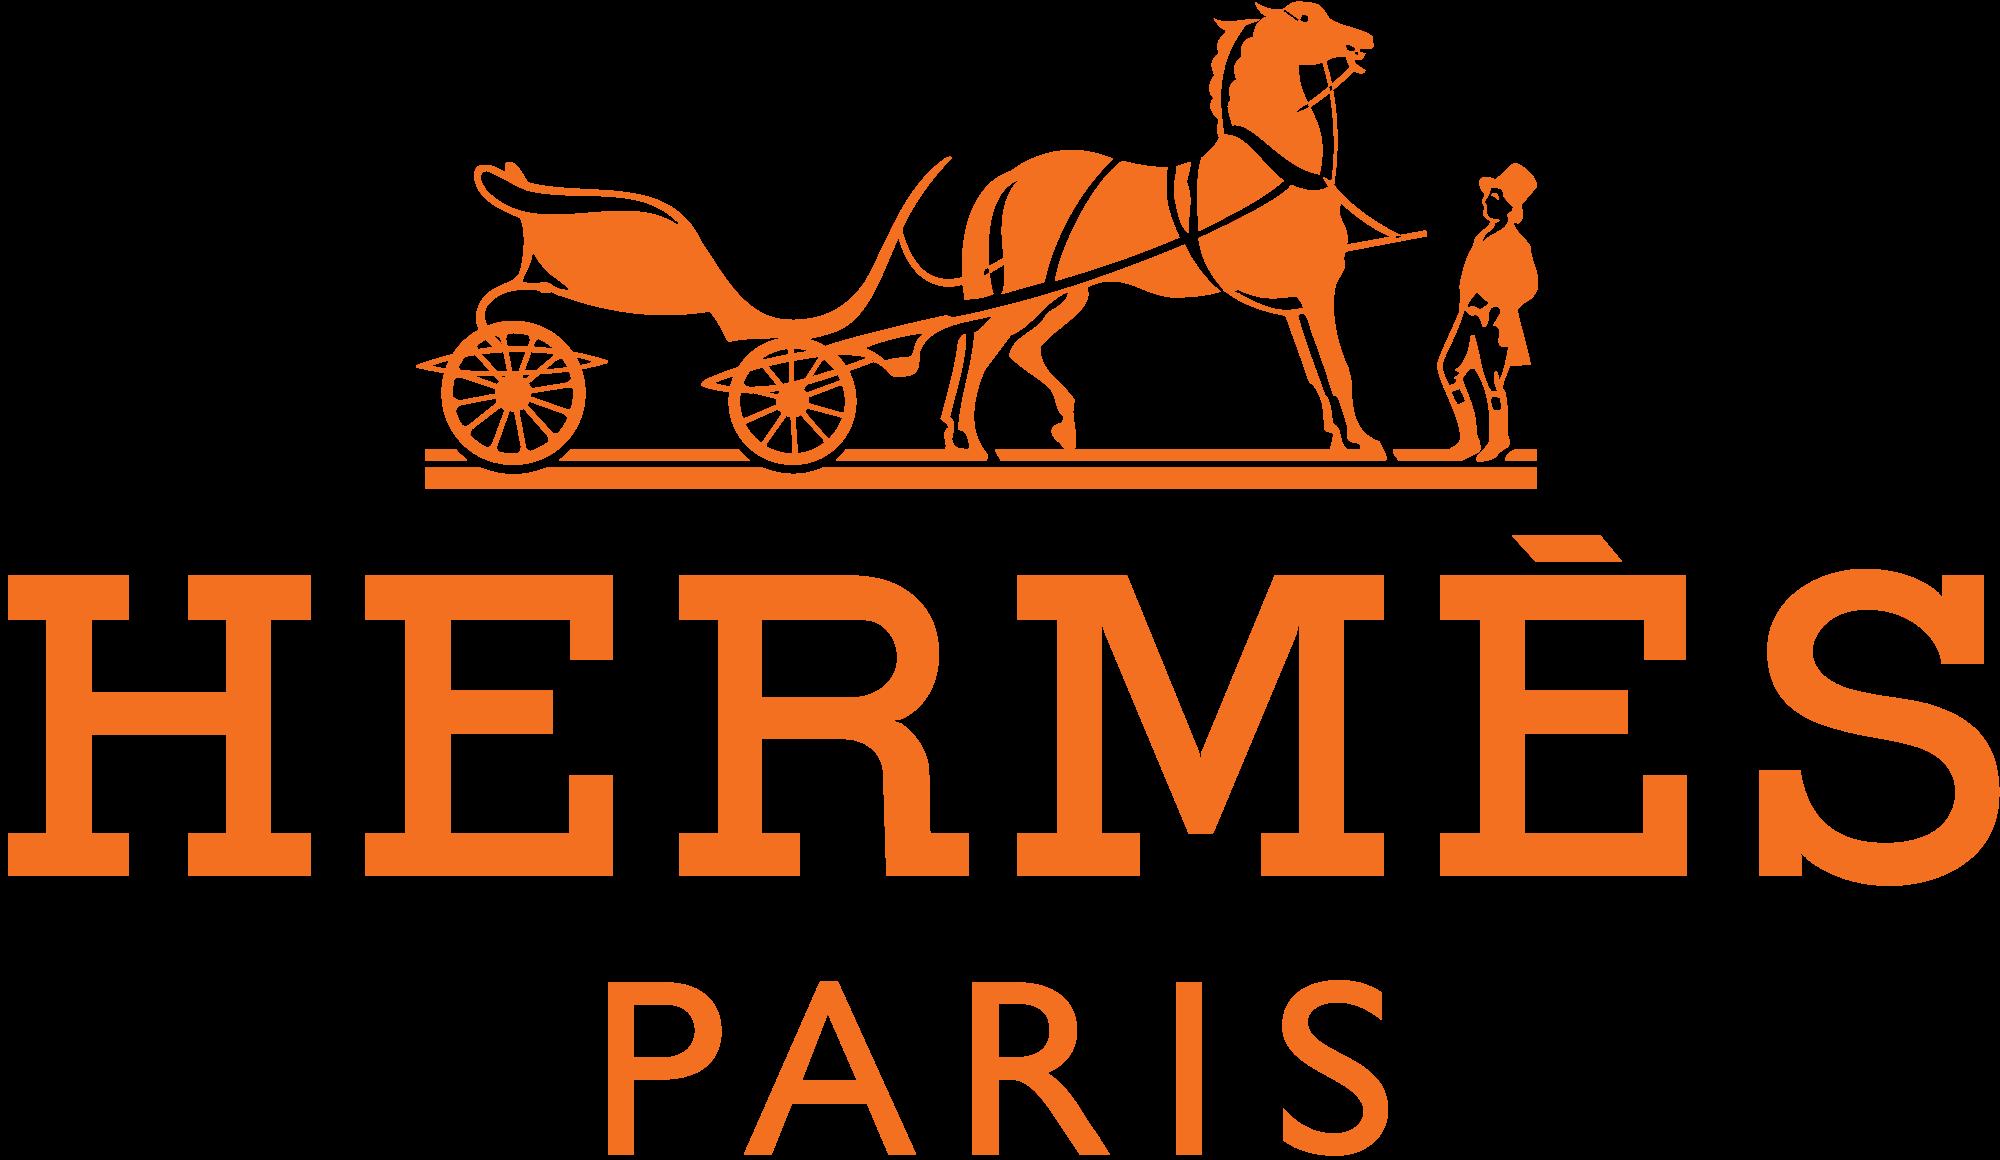 Hermès.png - Hermes PNG